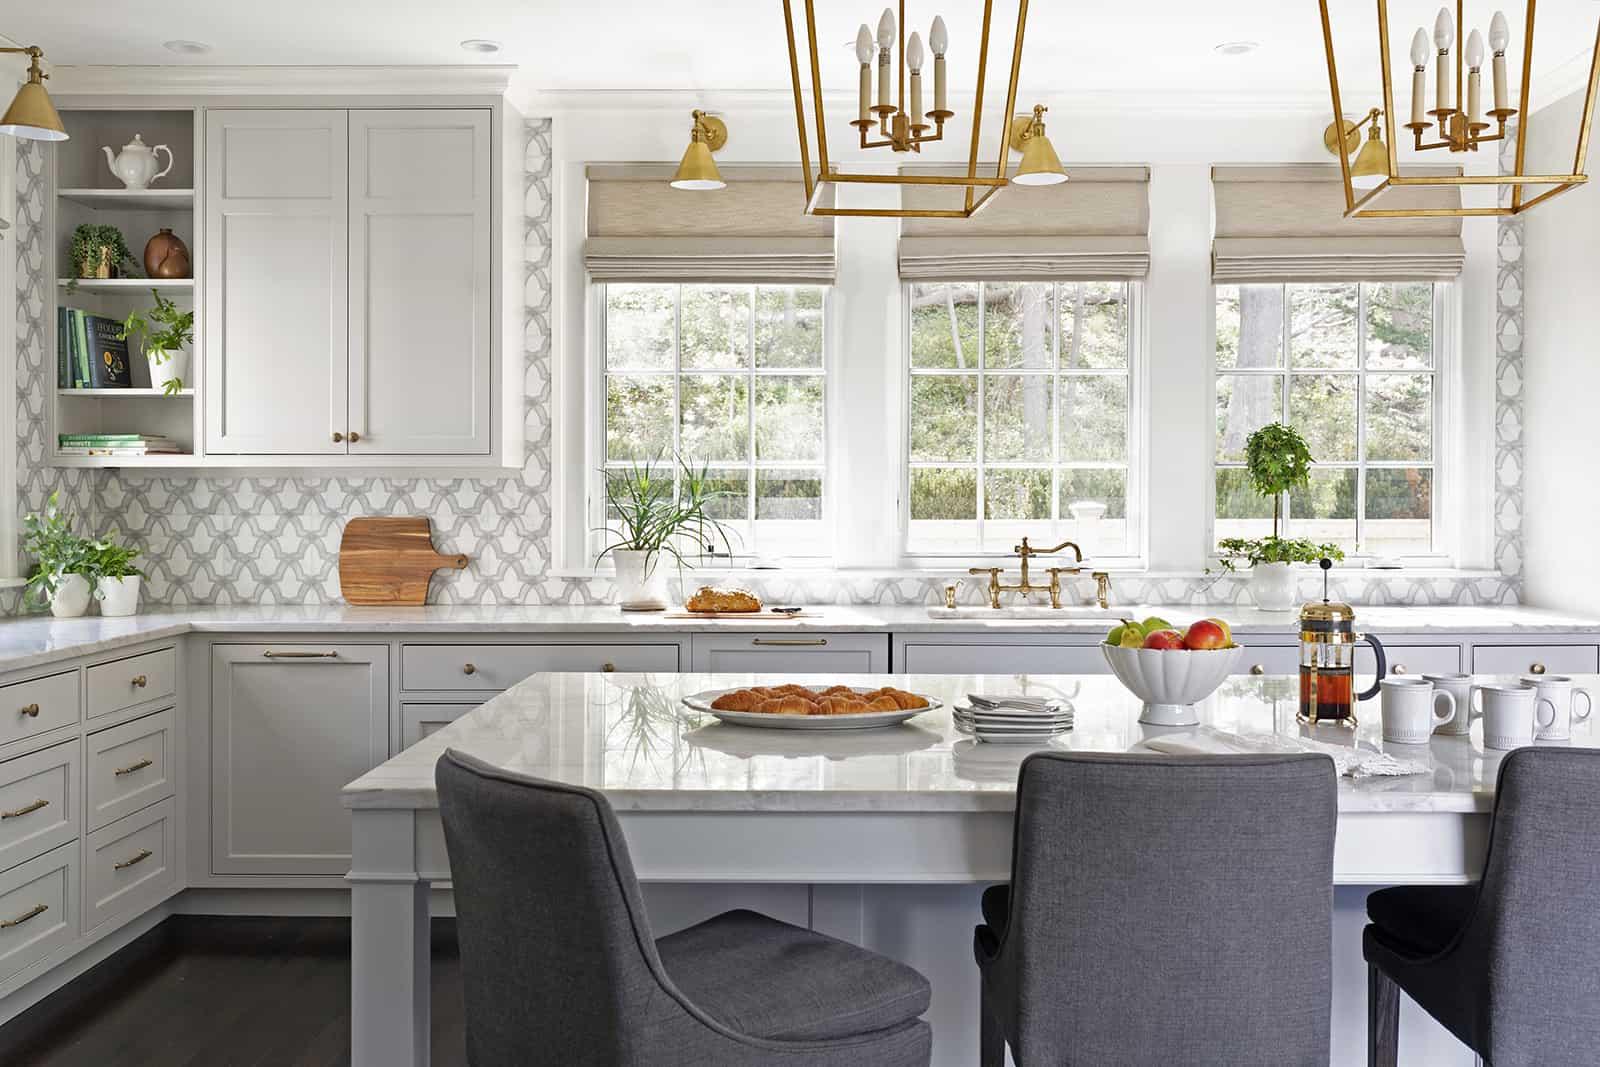 Evolve - HR - Oyster - Arctic White - Mary Michael O'Hare, MMO Designs Kitchen Backsplash